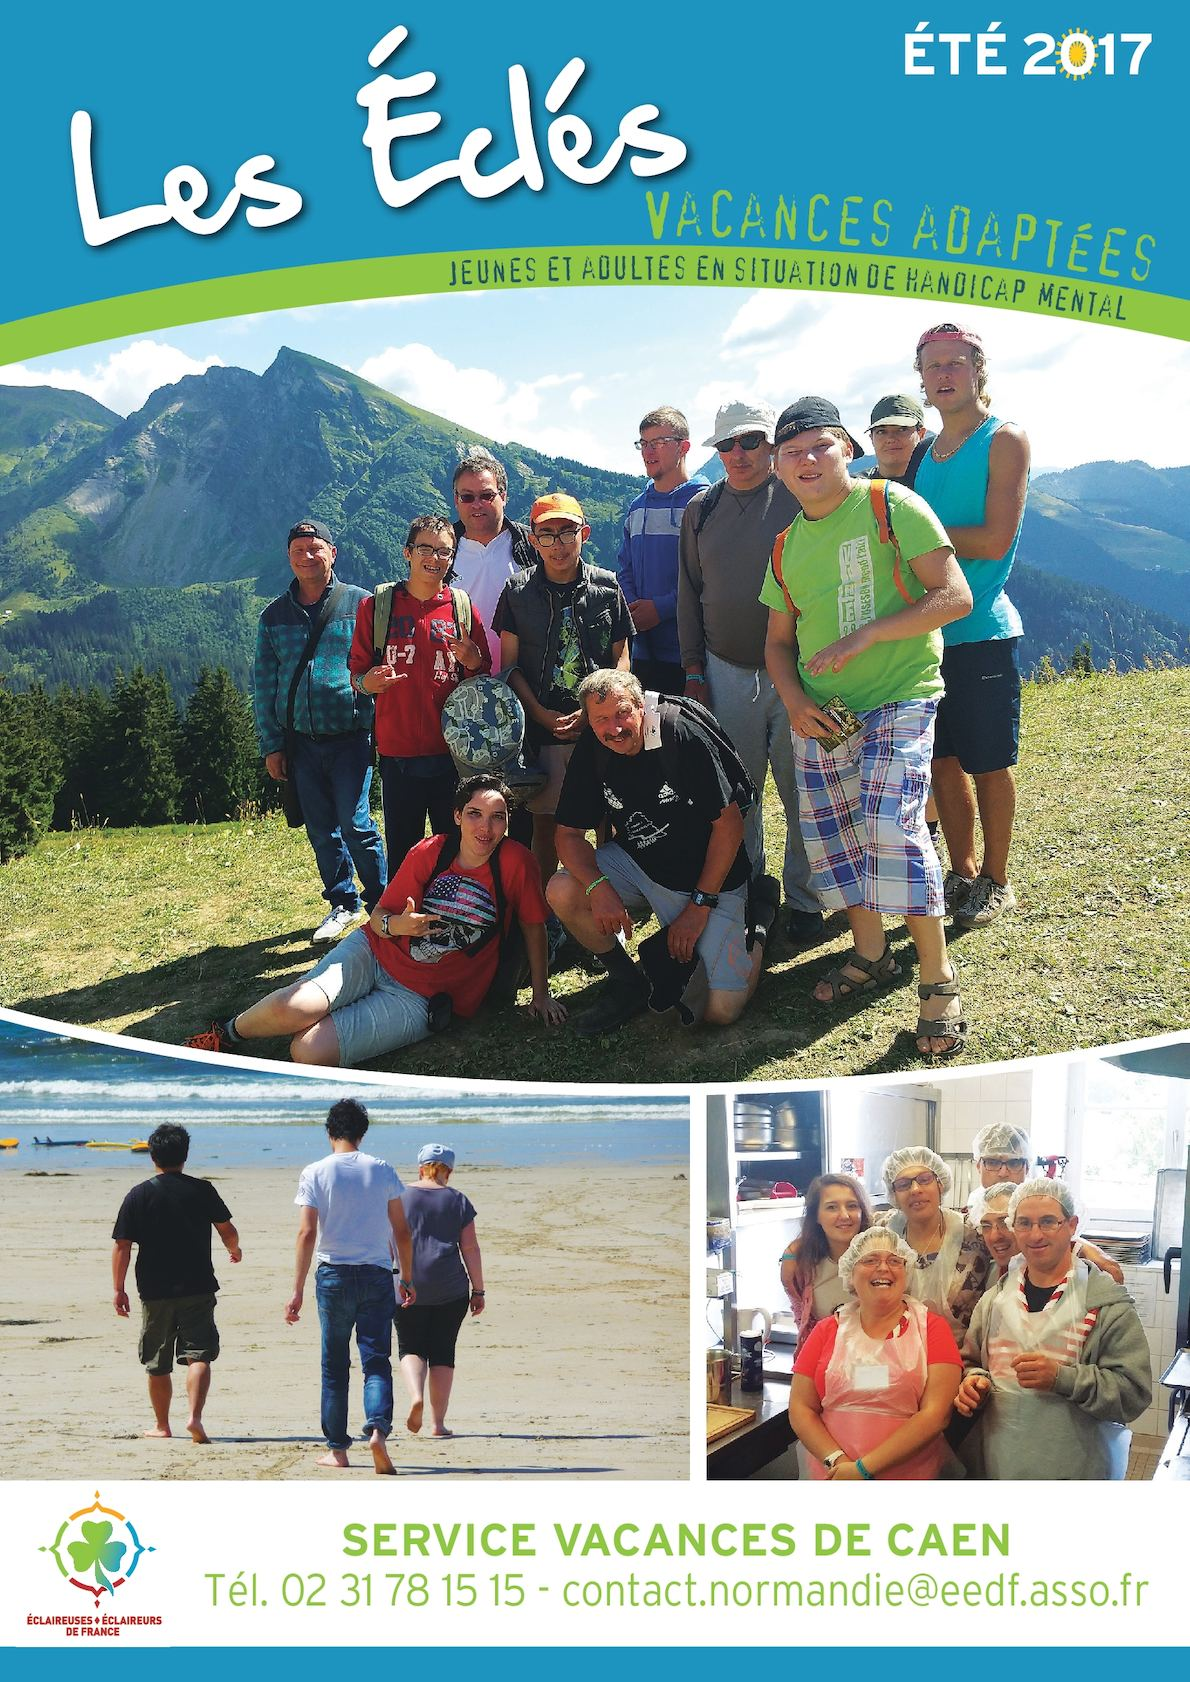 Top Calaméo - Brochure Adultes Ete 2017 vacances adaptées handicap mental GB23